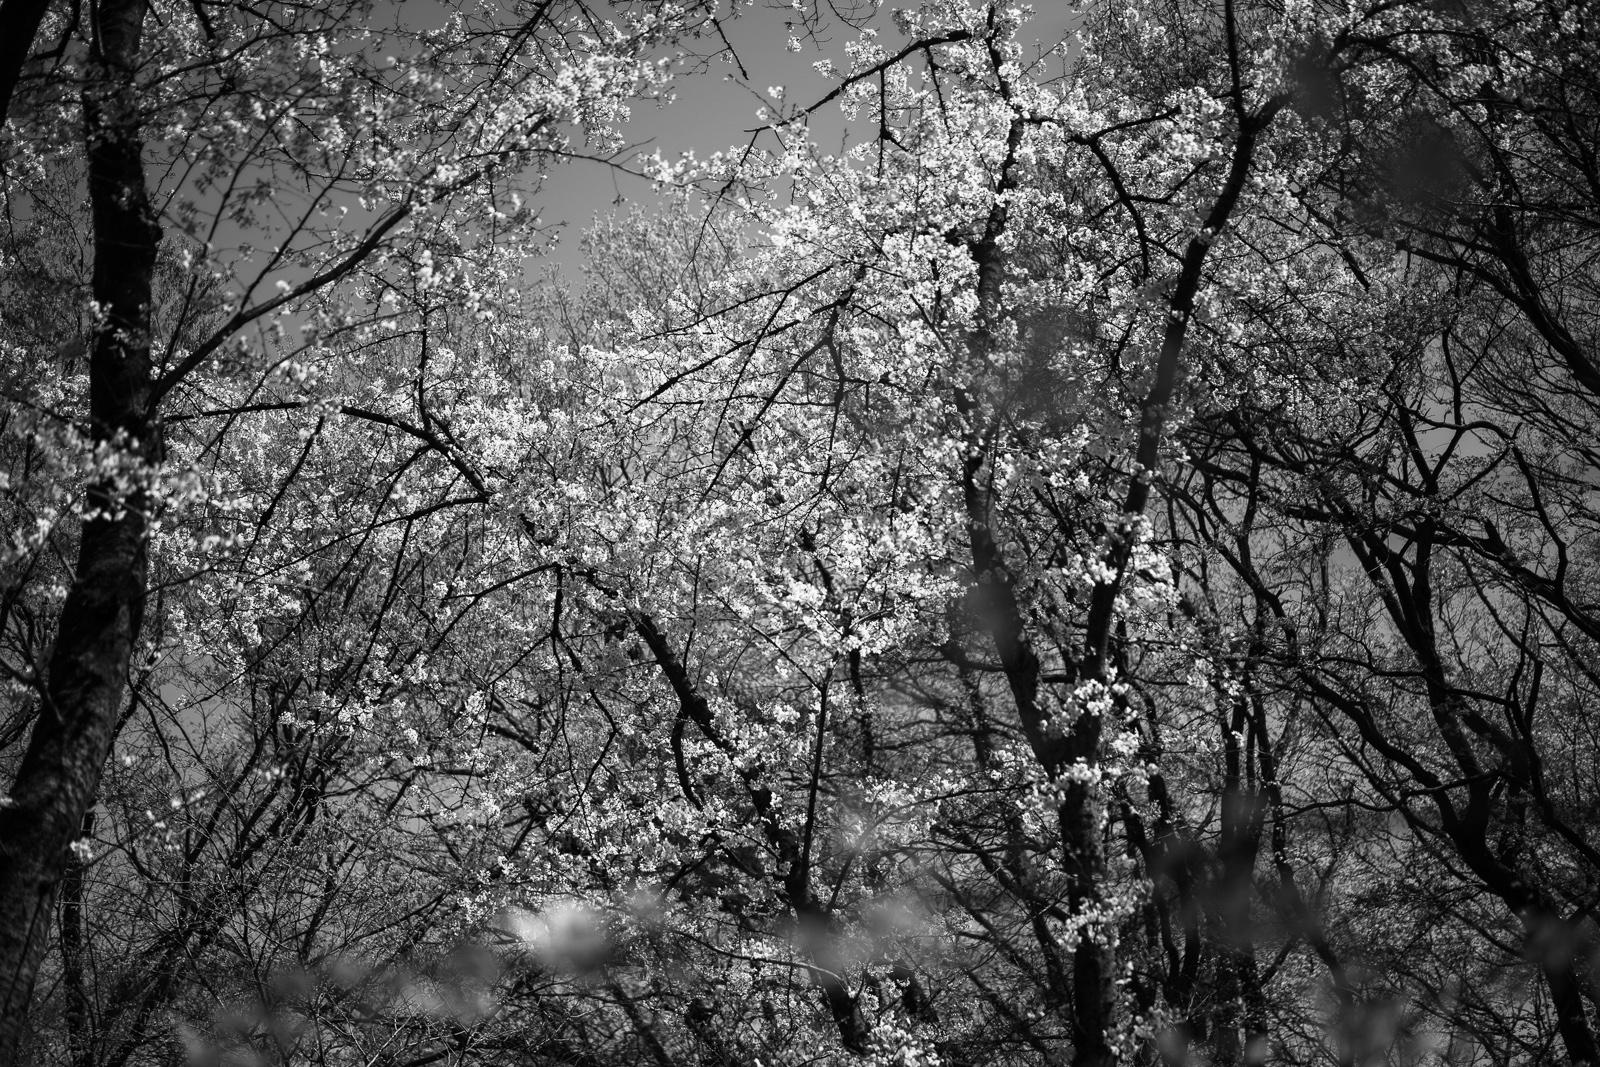 川崎市東高根森林公園 SONY α7RⅢ fe55mm f1.8